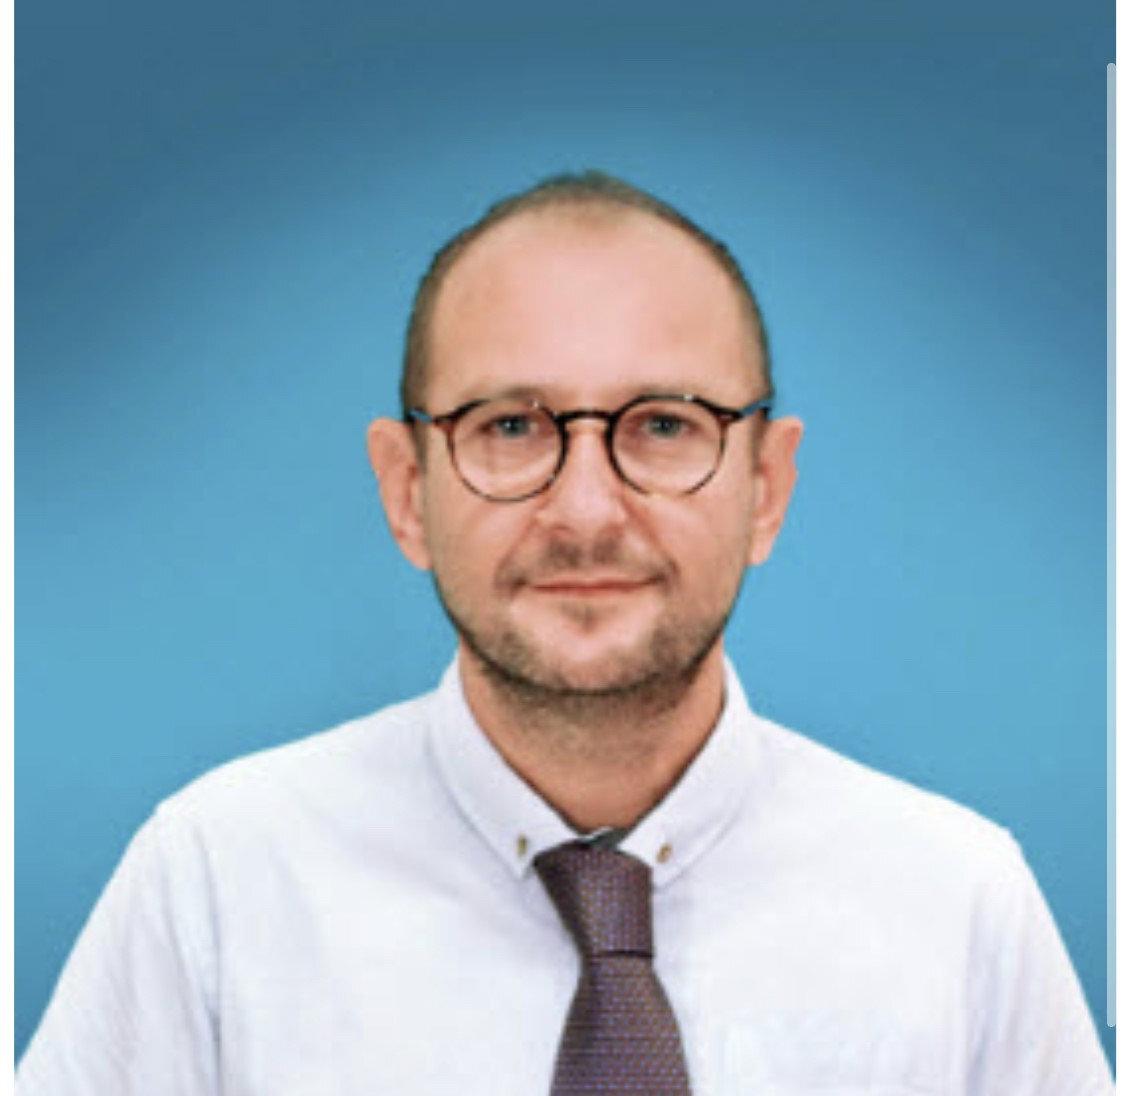 Patrick Ferrent